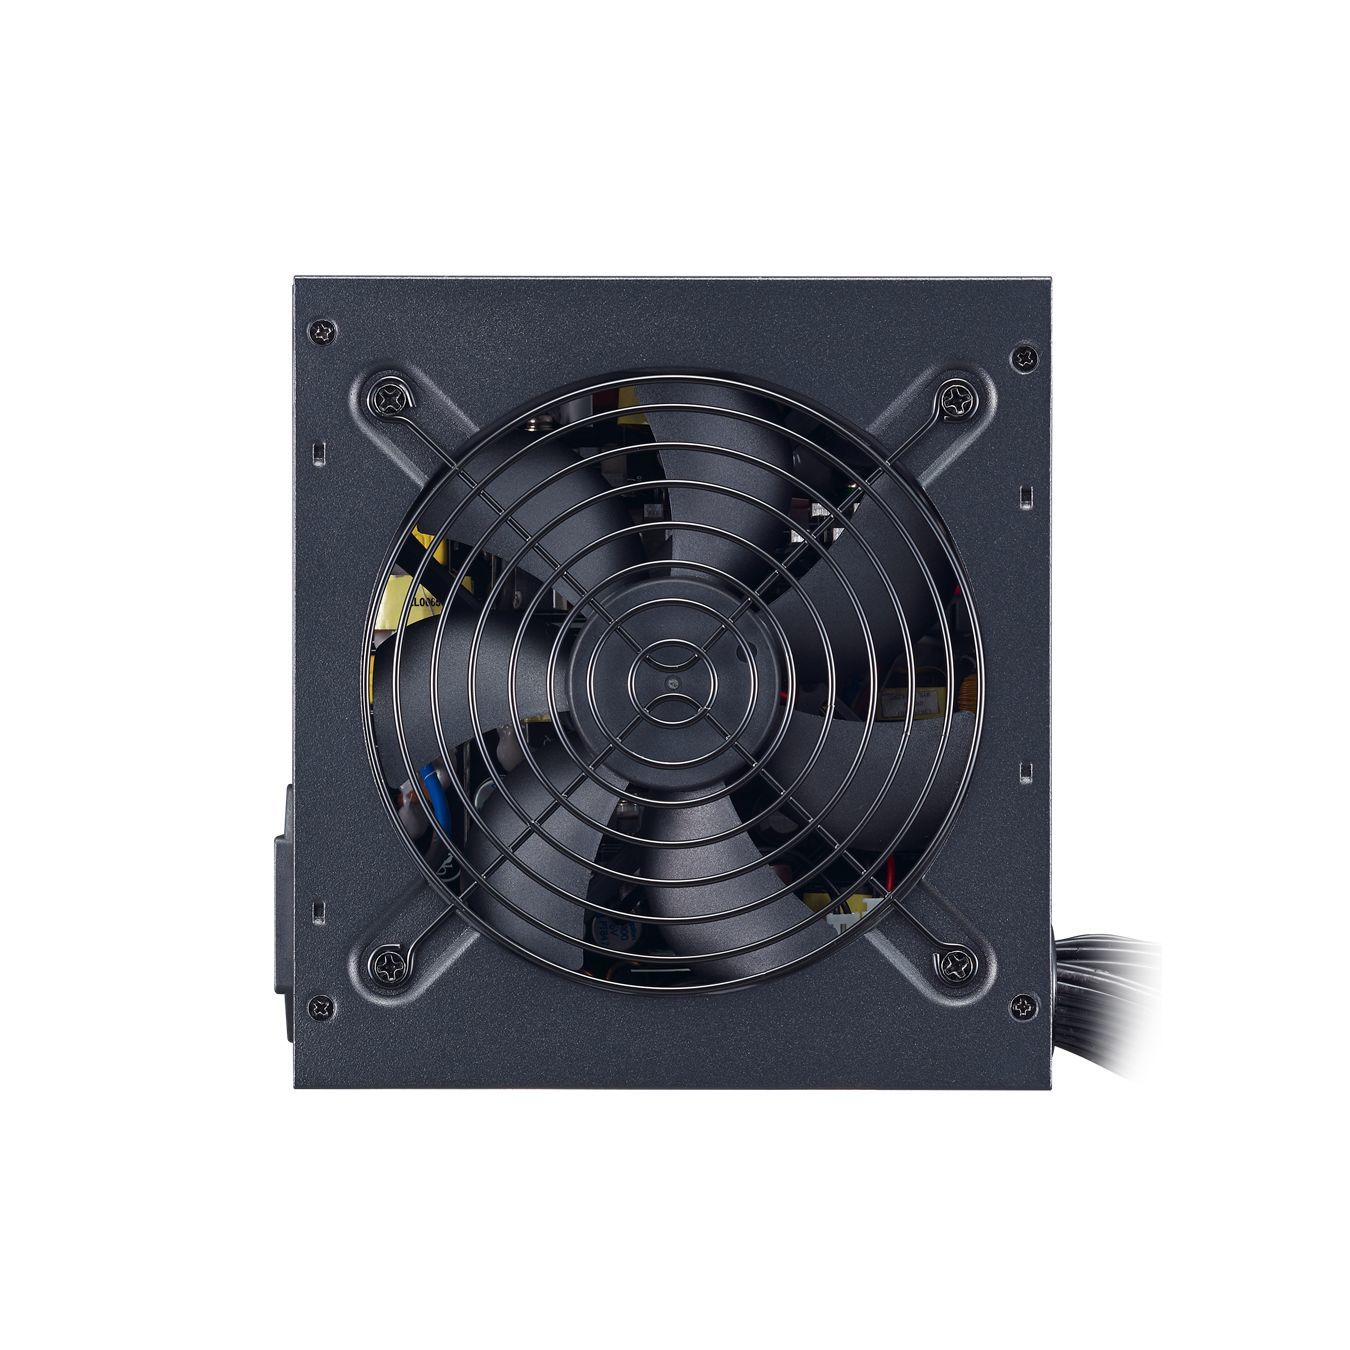 Alimentation non modulaire MWE 550 W V2 80+ Bronze Cooler Master